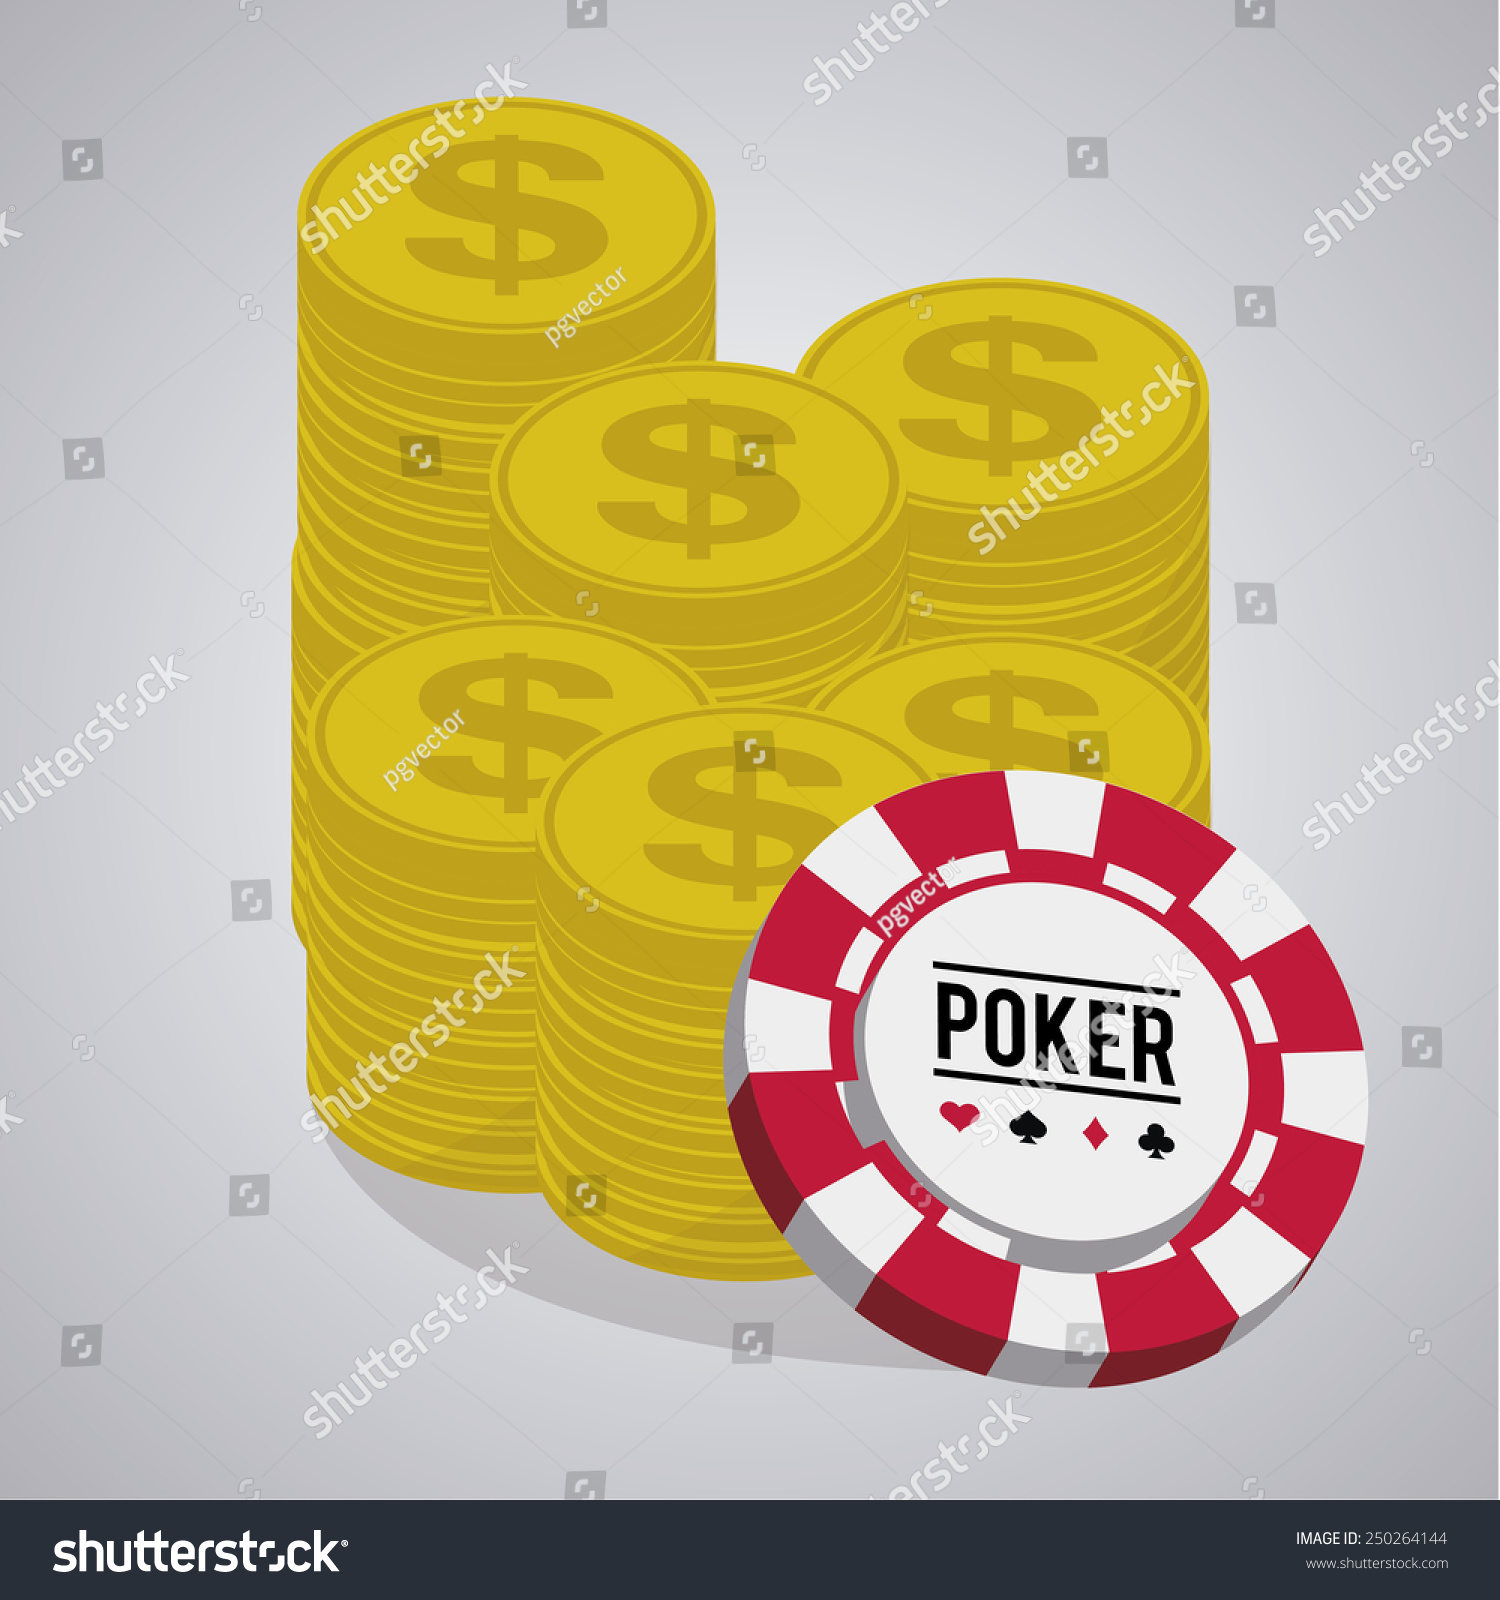 Online gambling waste of money